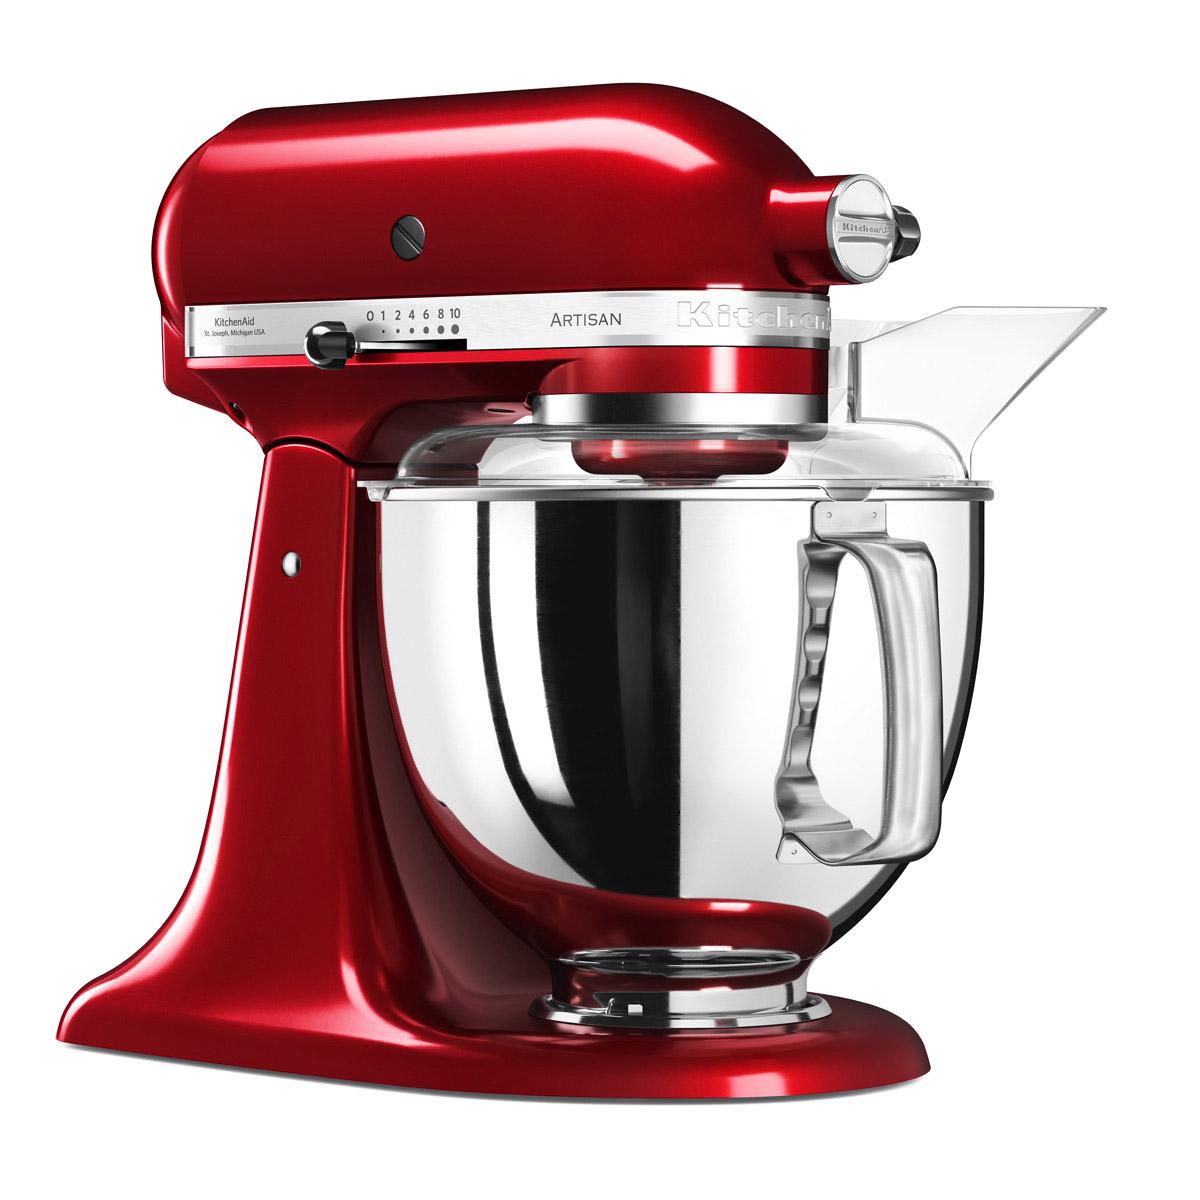 KitchenAid Artisan Elegance standmixer 4,8 liter Appelrood